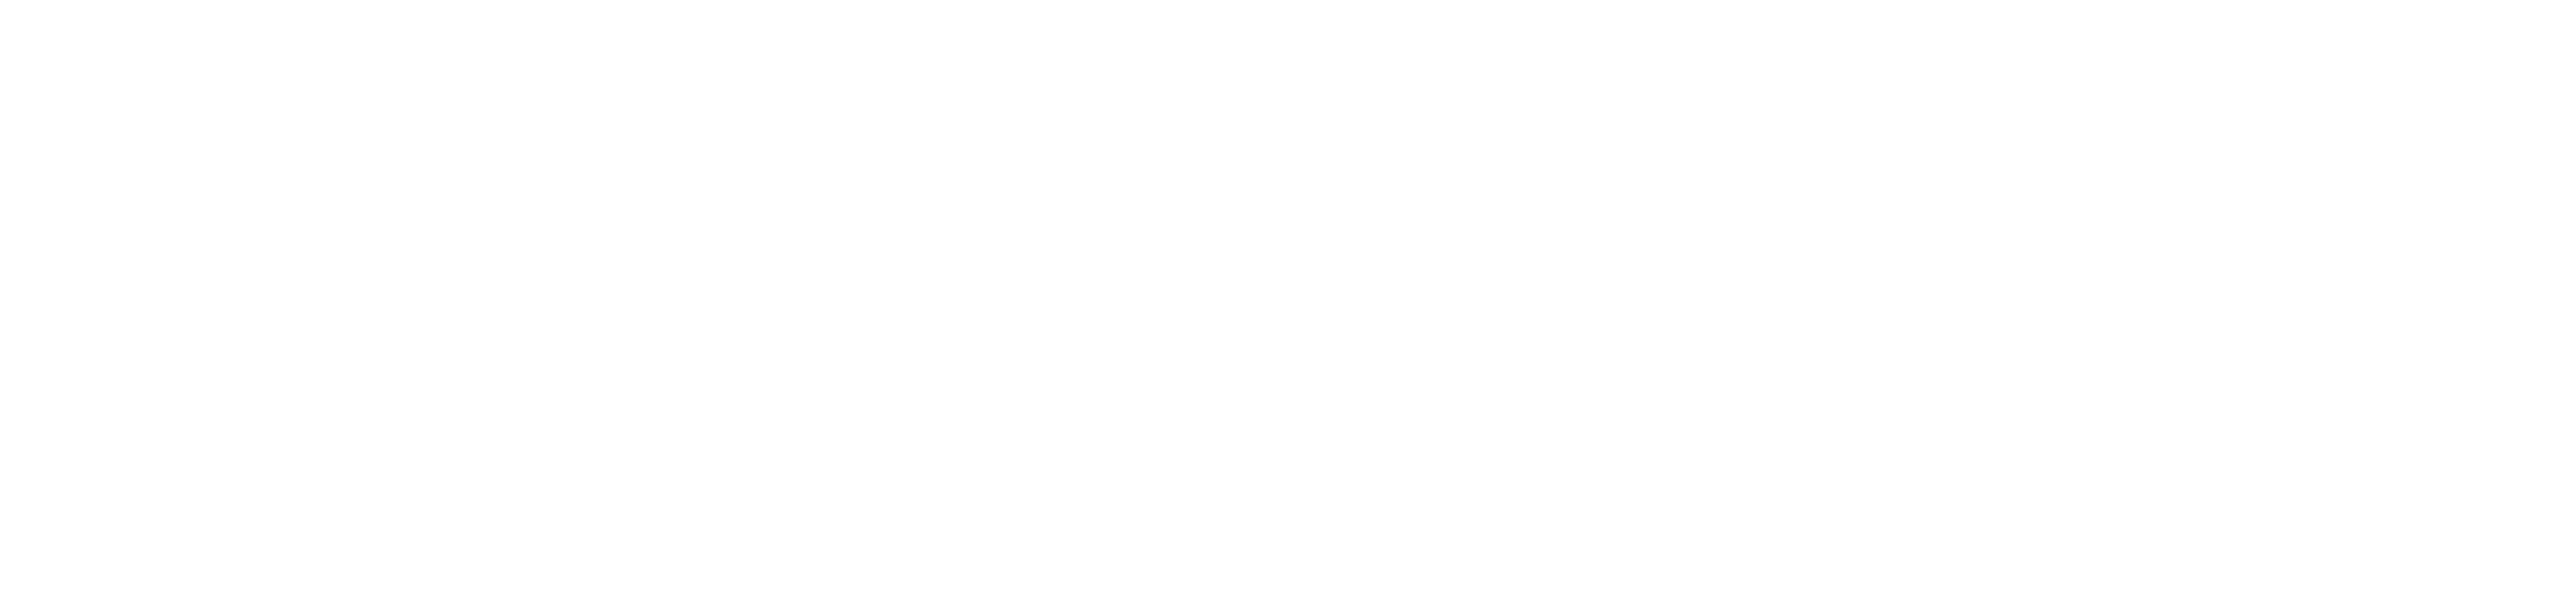 conservatory-valet-white